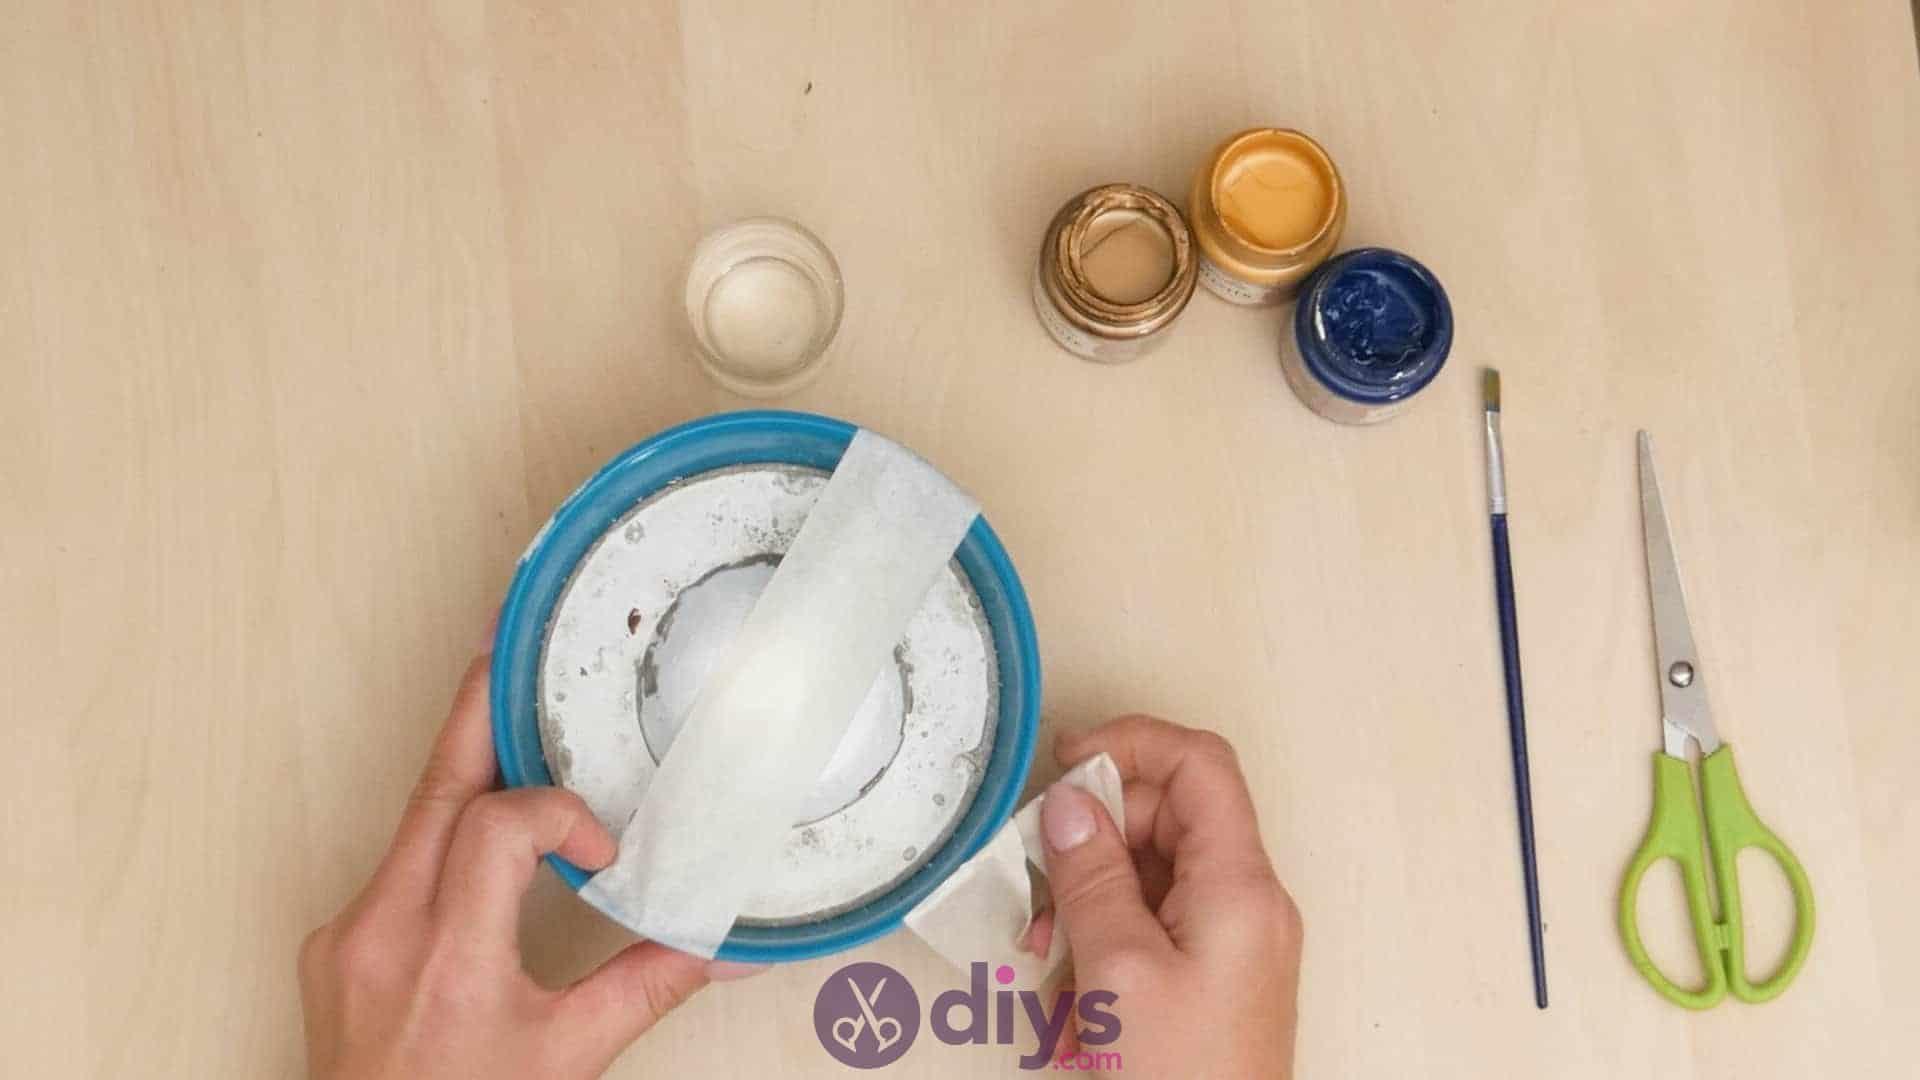 Diy concrete ashtray step 5